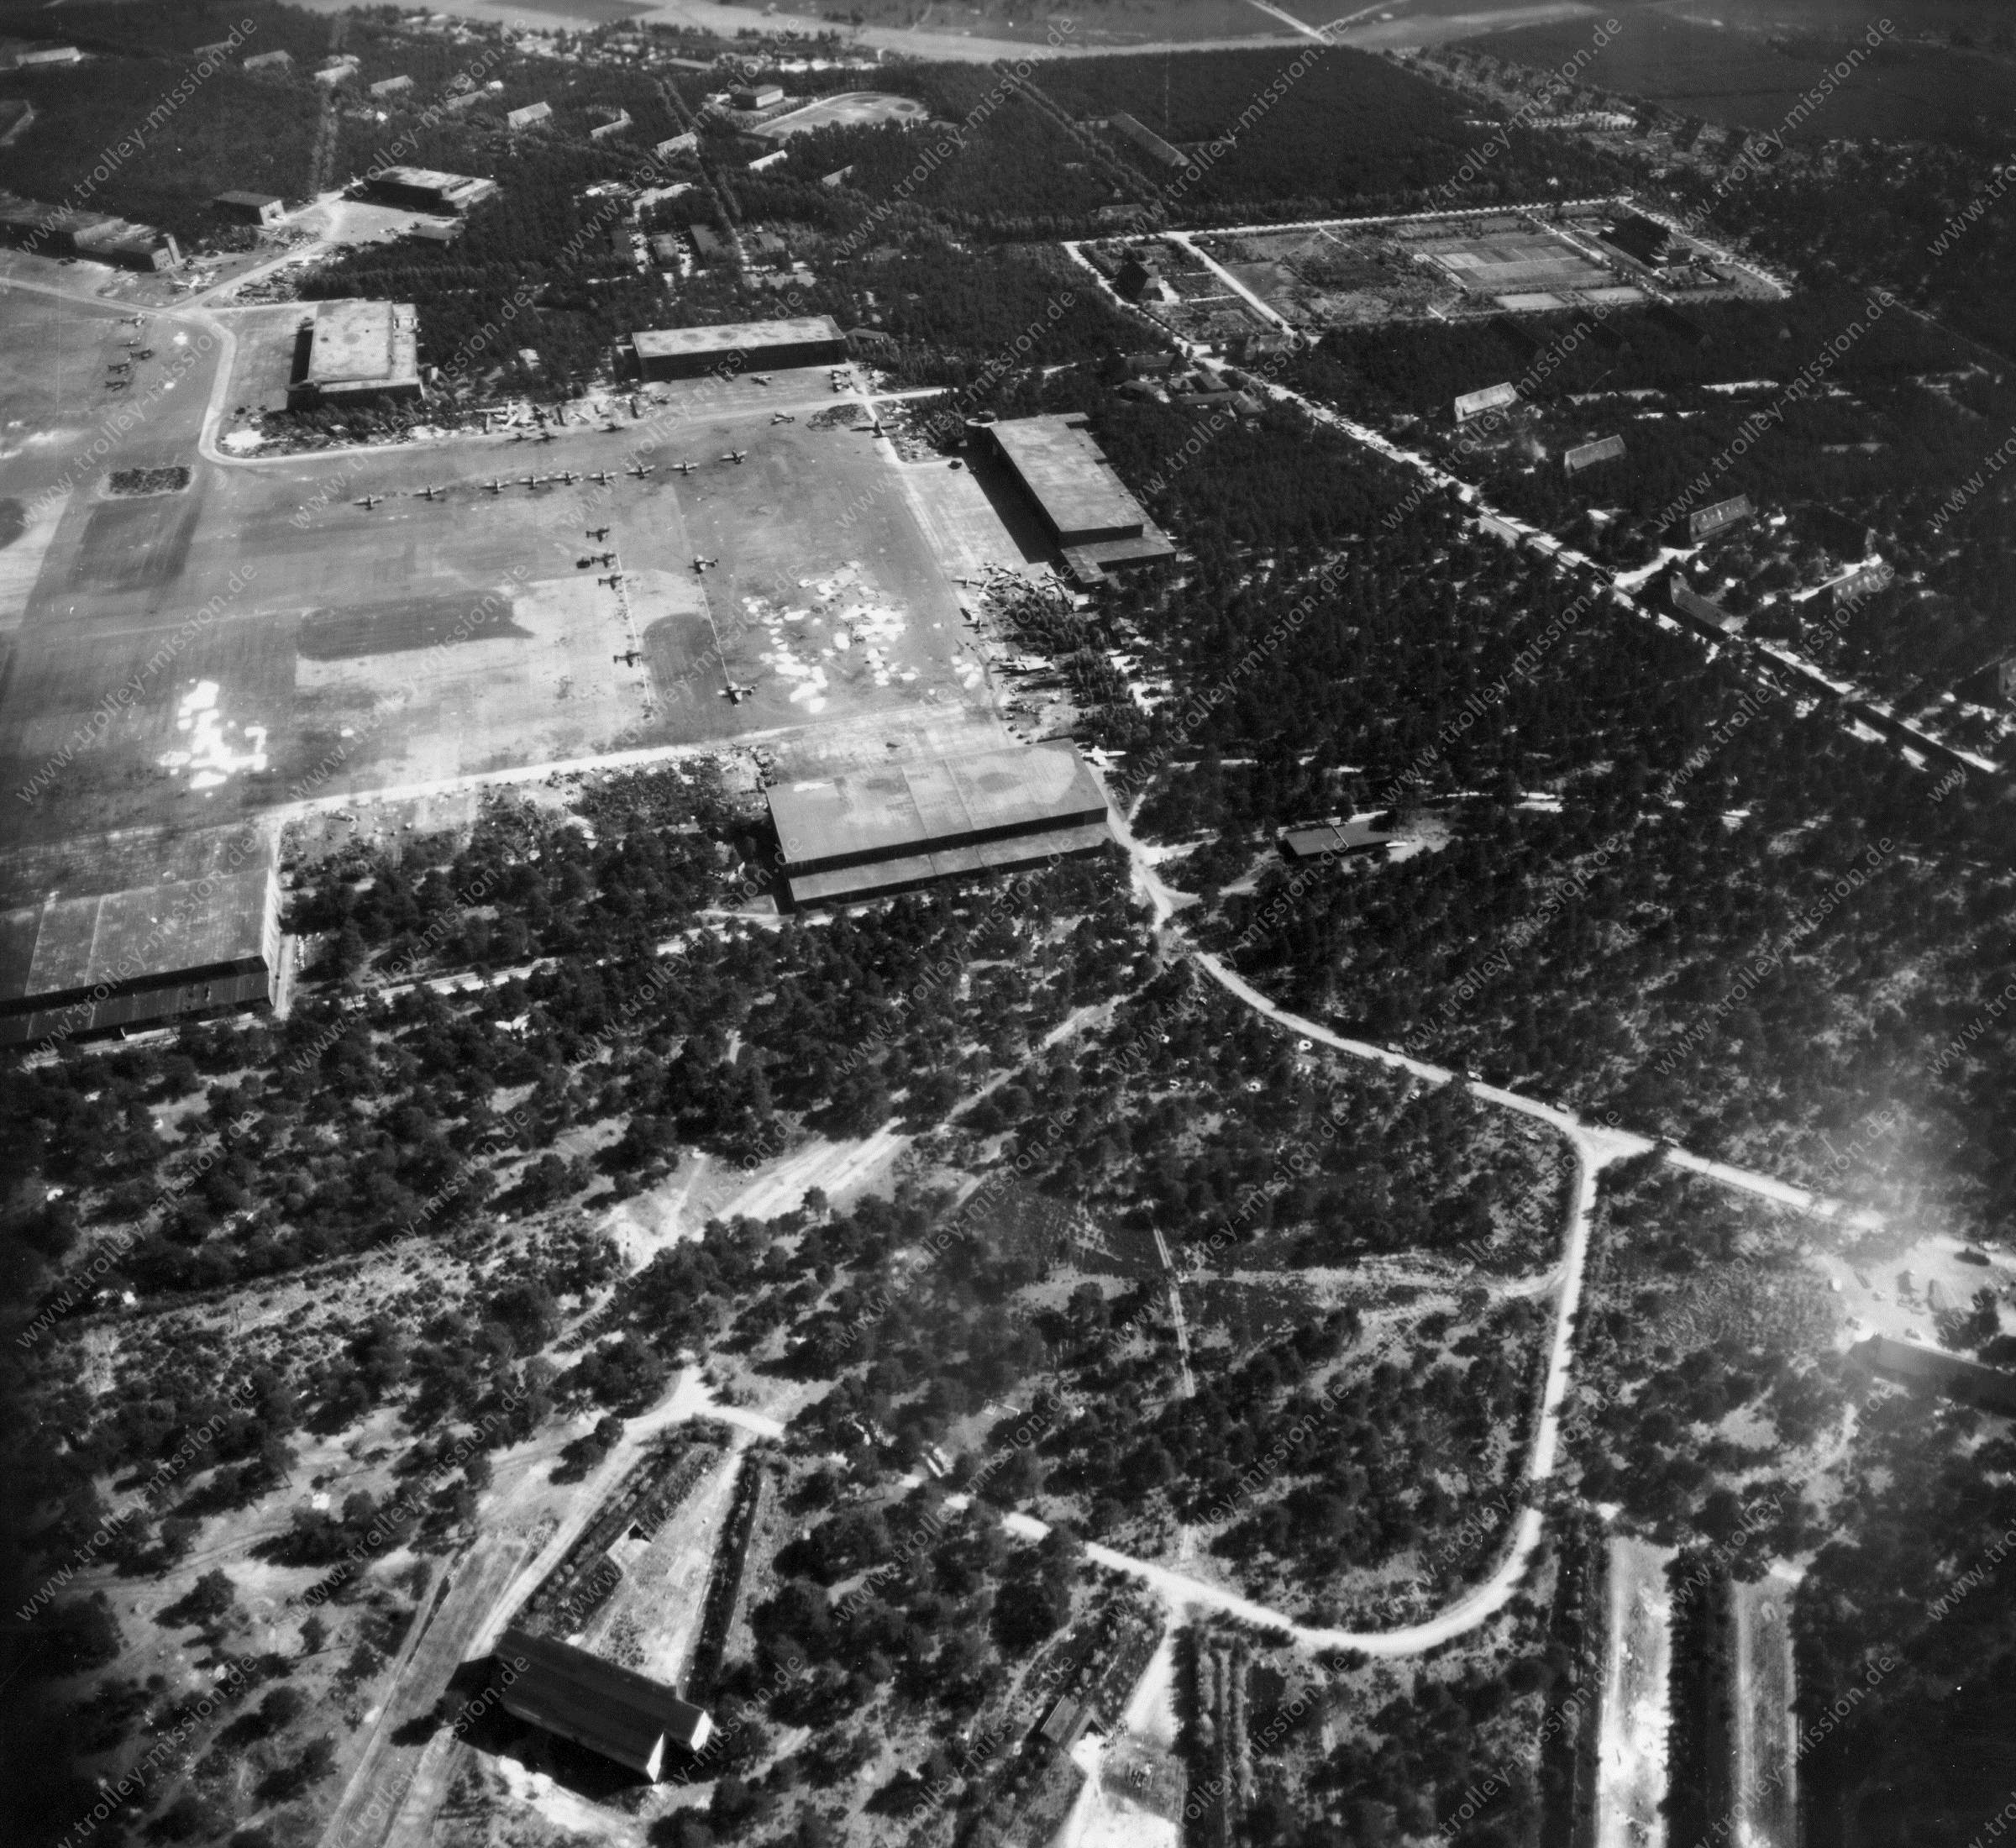 Luftbild Fliegerhorst Faßberg der Luftwaffe